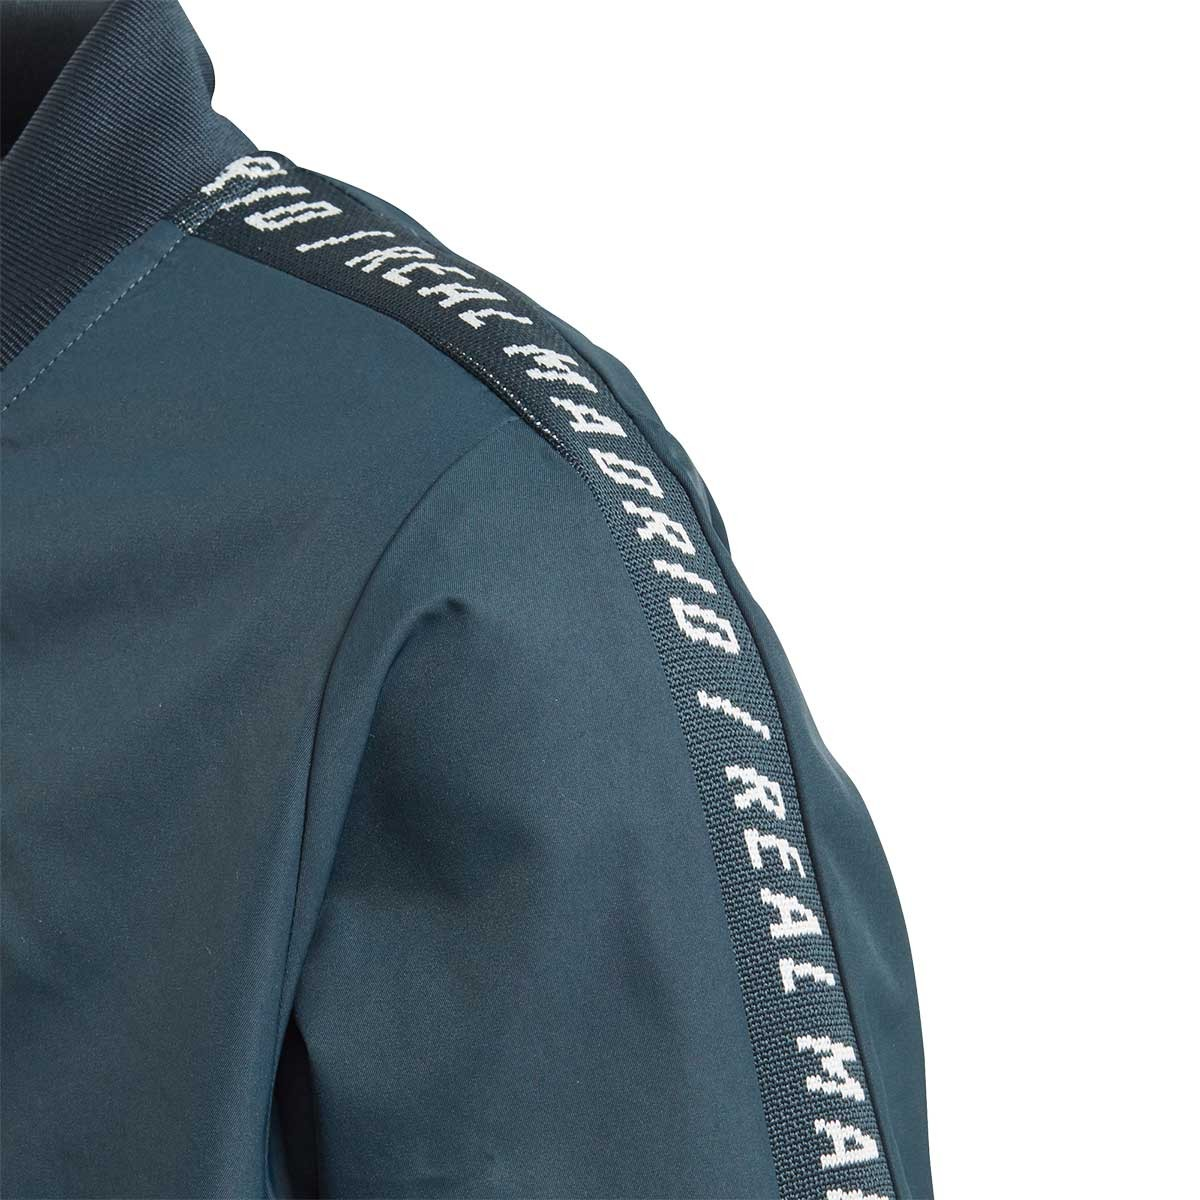 b101f97e5 Jacket adidas Kids Real Madrid Anthem 2018-2019 Tech onix - Football store  Fútbol Emotion